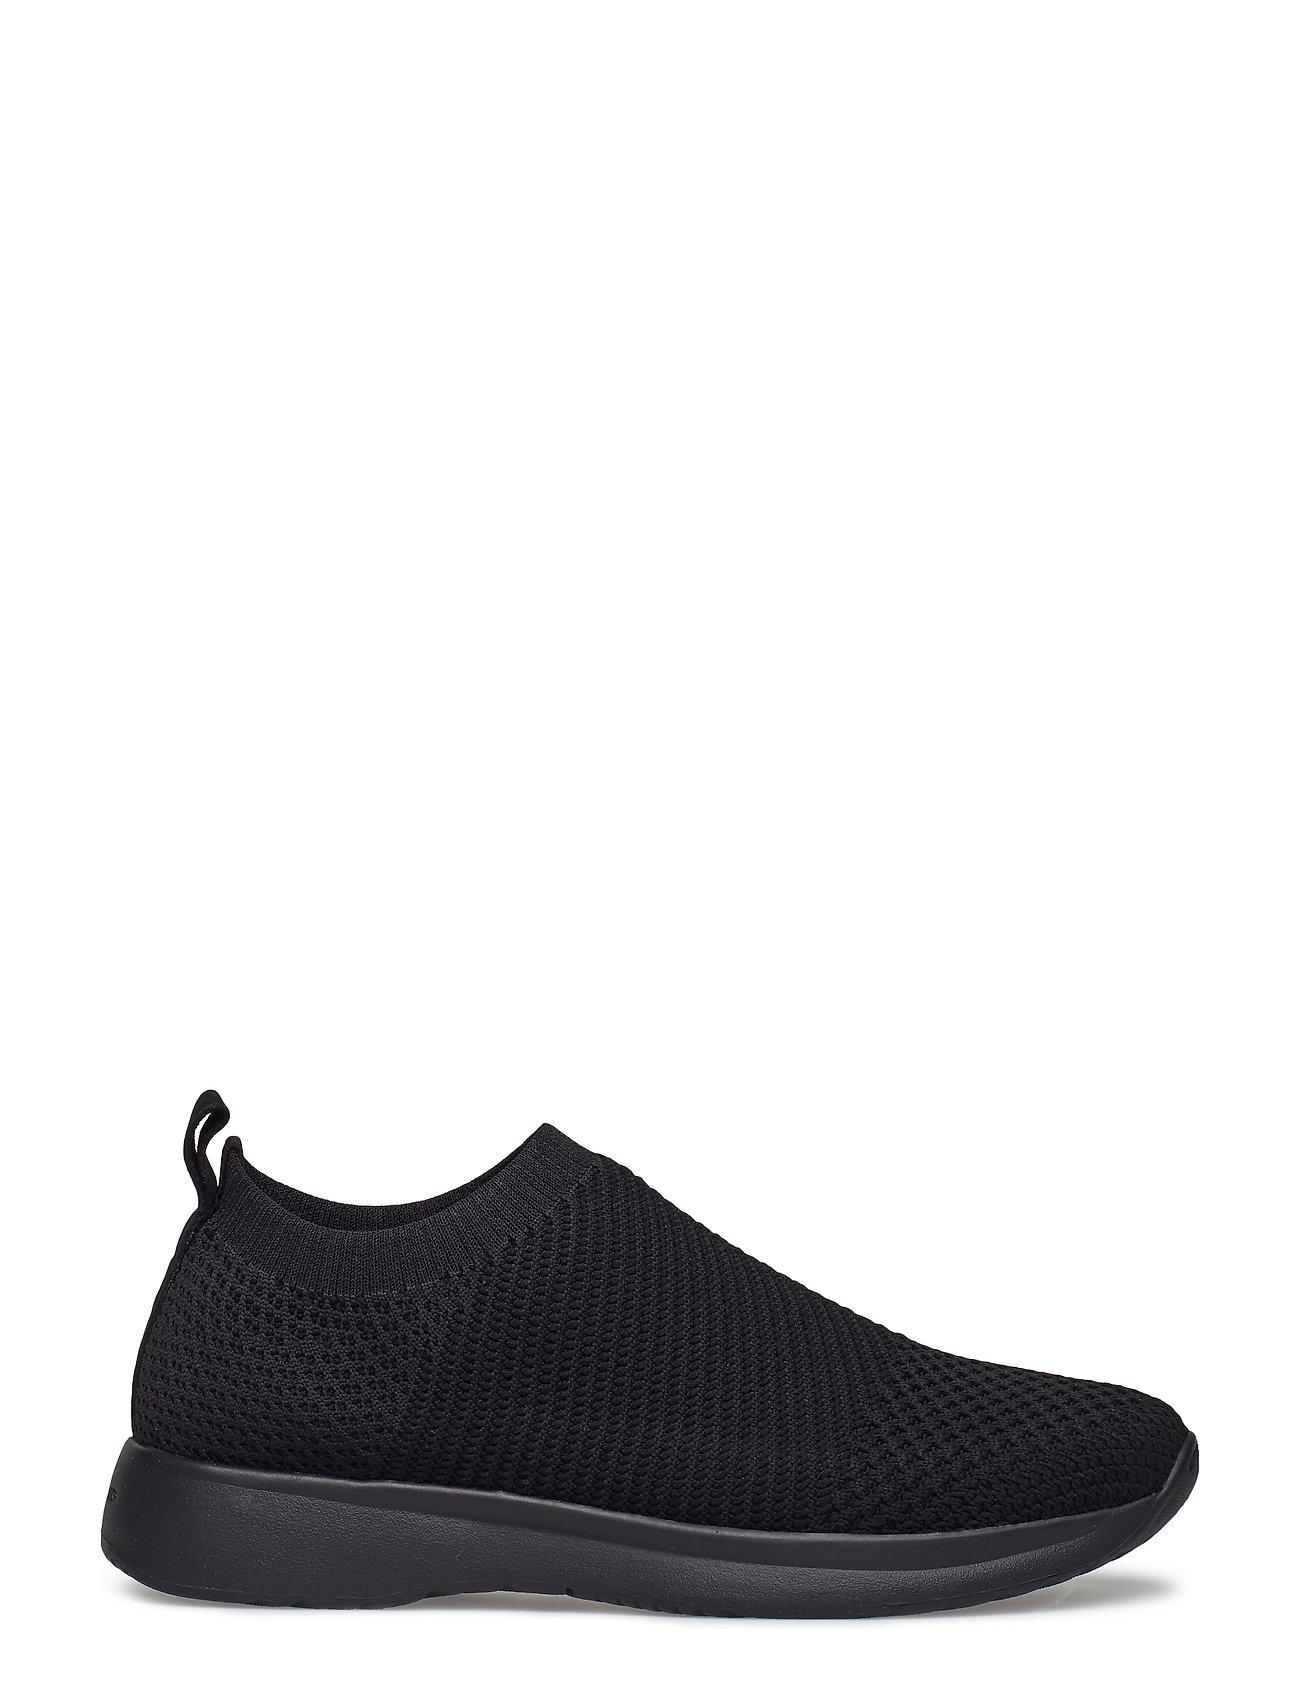 Vagabond Kasai Black Textile Lo Sneakers